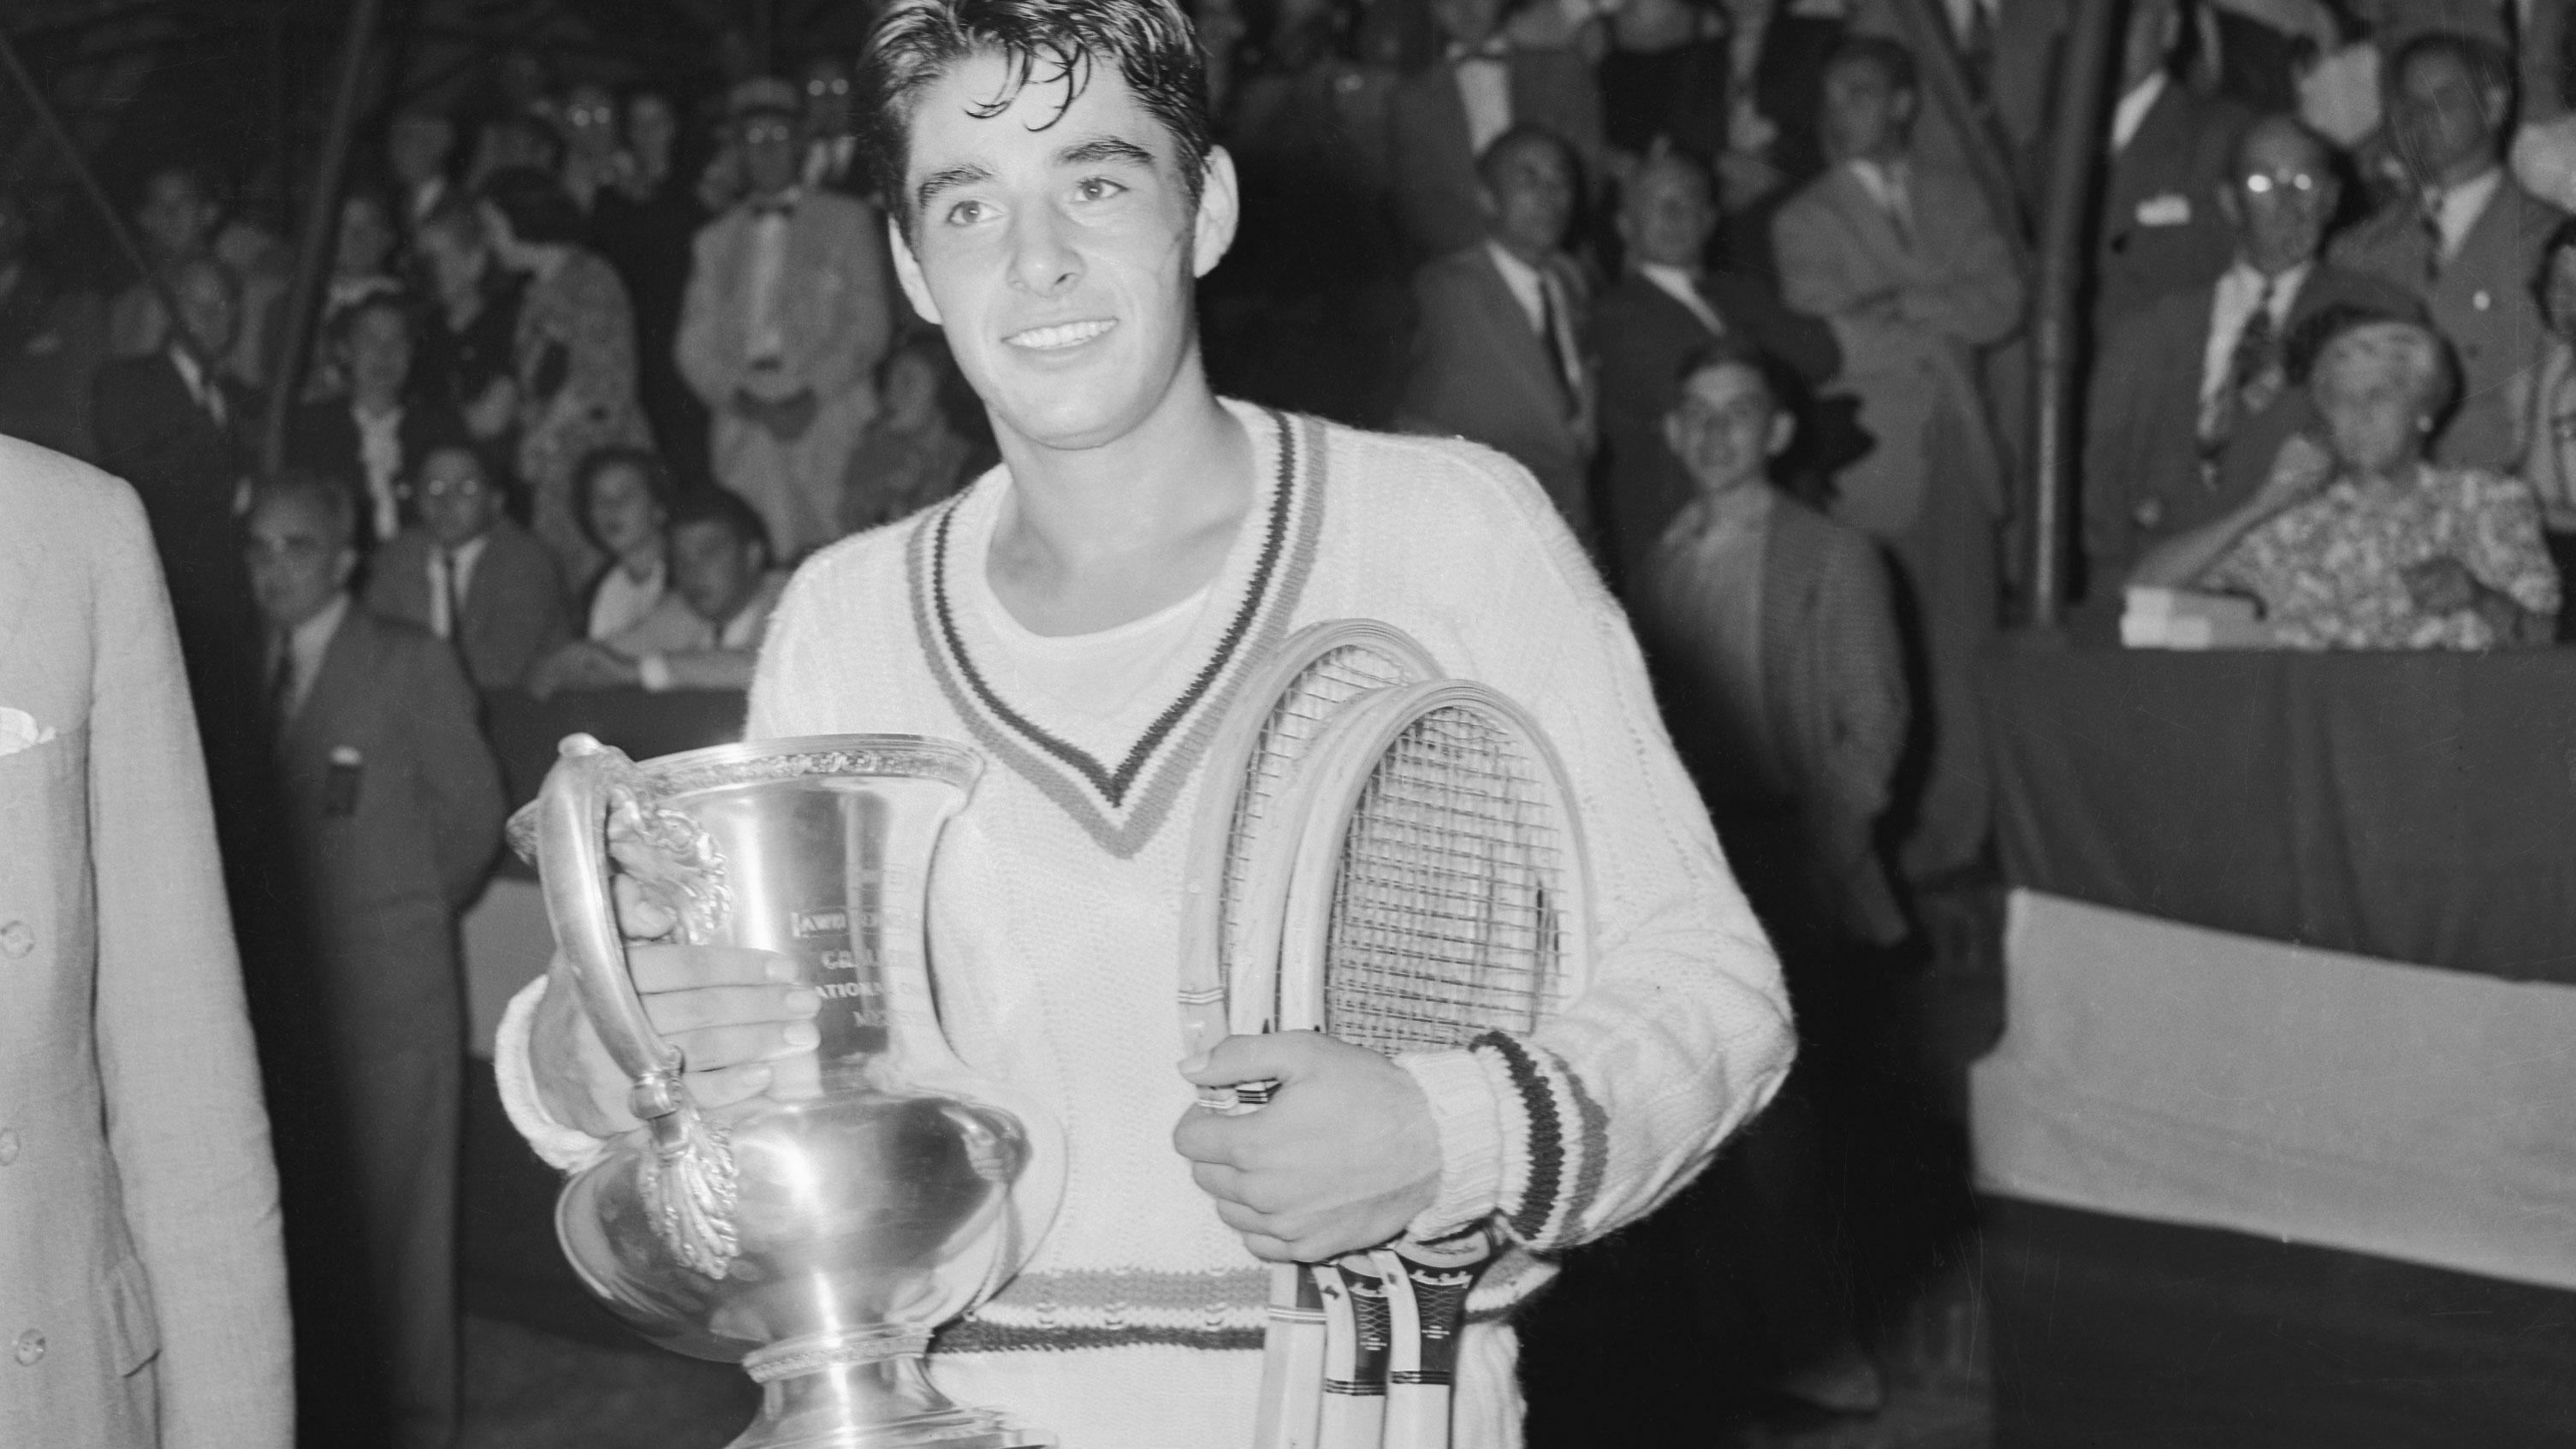 Richard Gonzales Holding Tennis Trophy